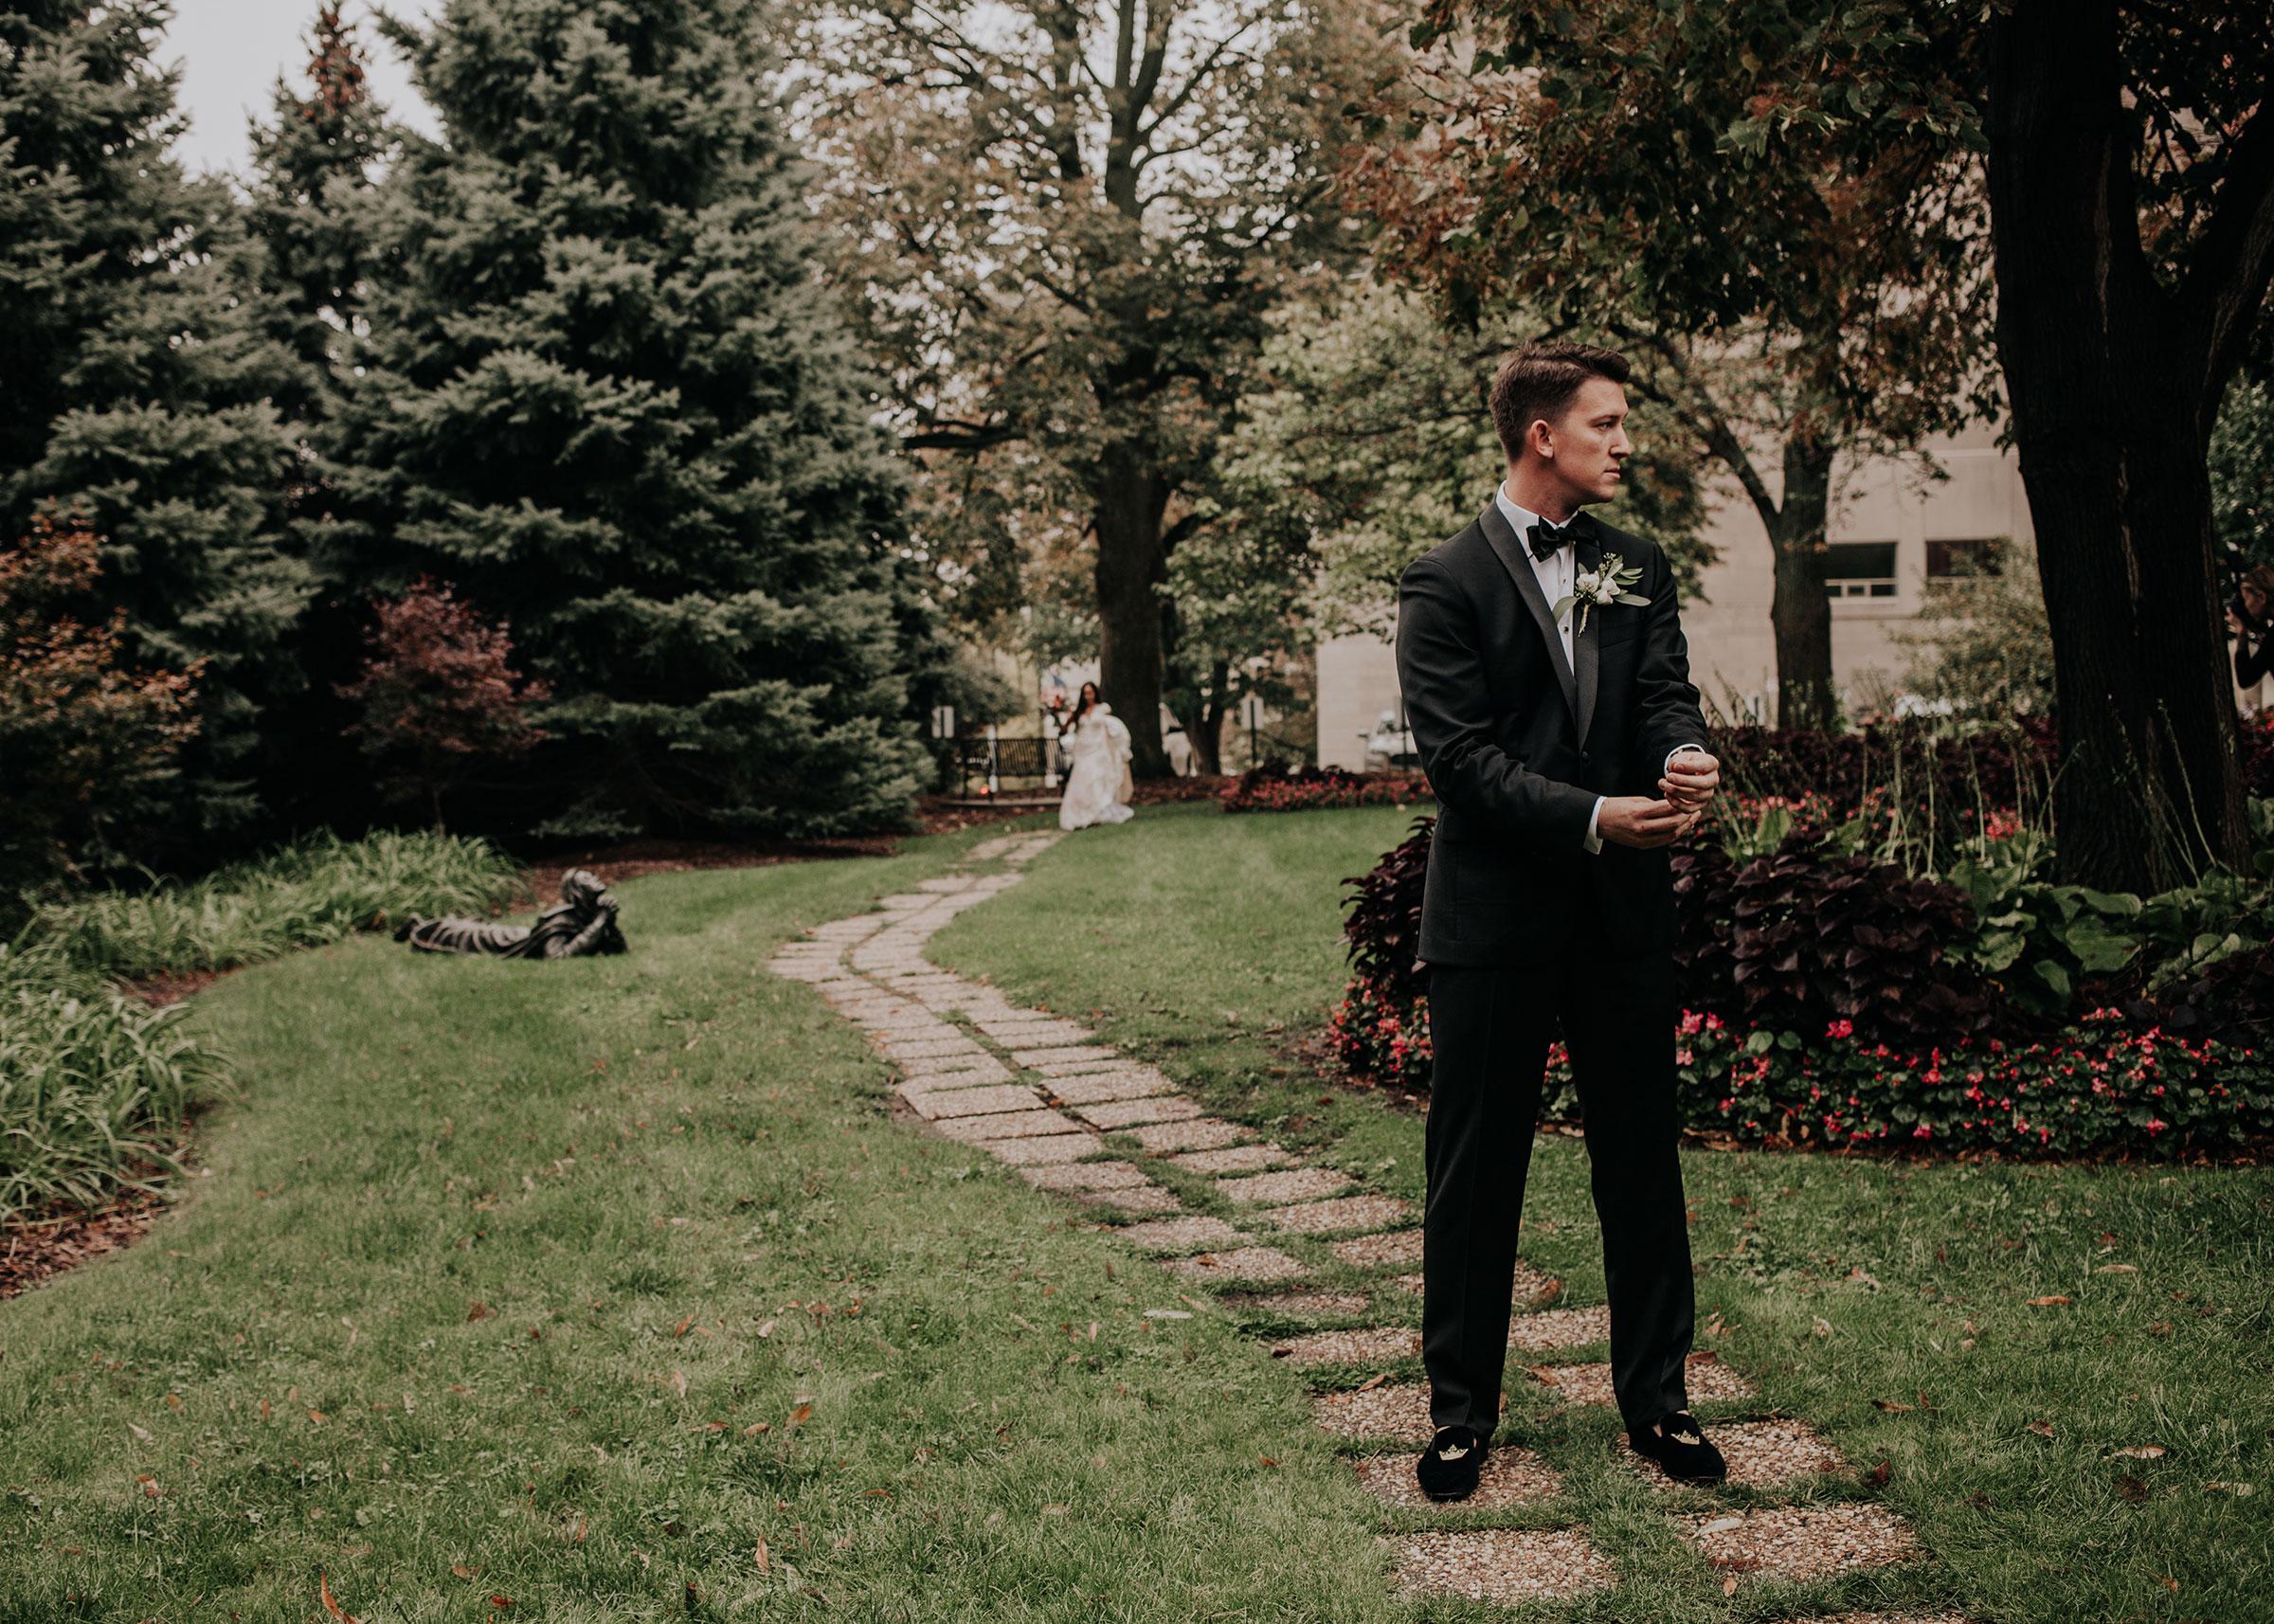 groom-waiting-for-bride-during-first-look-st-johns-church-at-creighton-omaha-nebraska-raelyn-ramey-photography.jpg